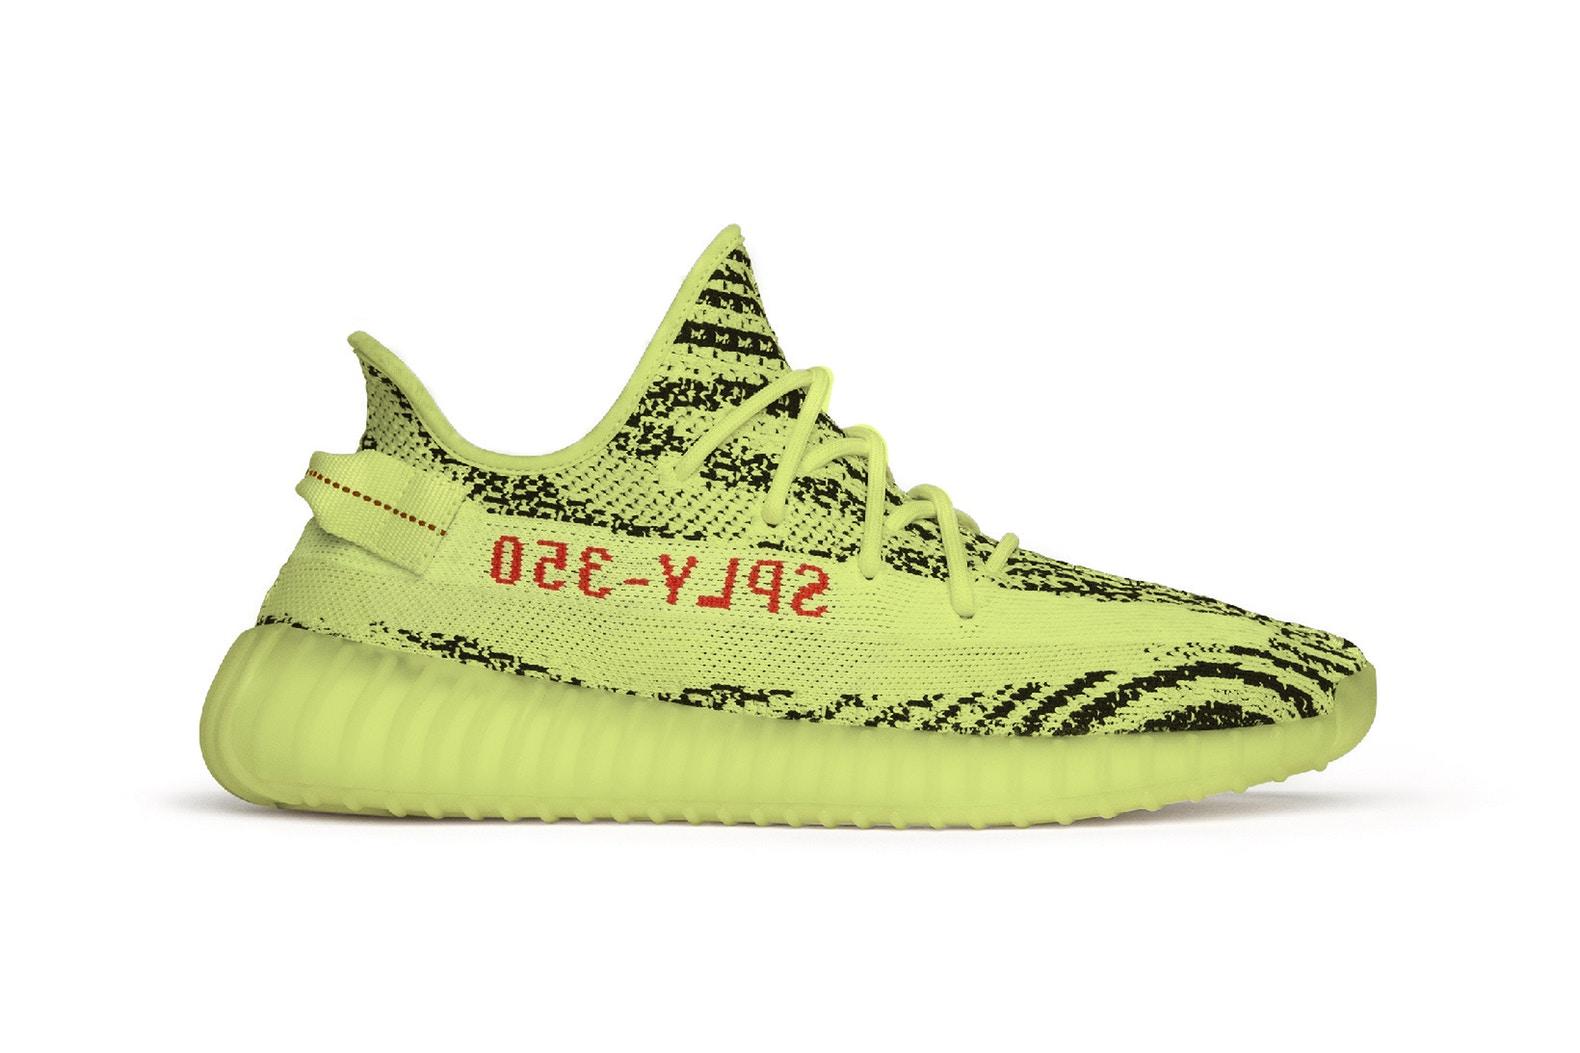 Kanye Wears The adidas YEEZY Boost 350 V2 In Unreleased 'Semi Frozen Yellow' Colourway